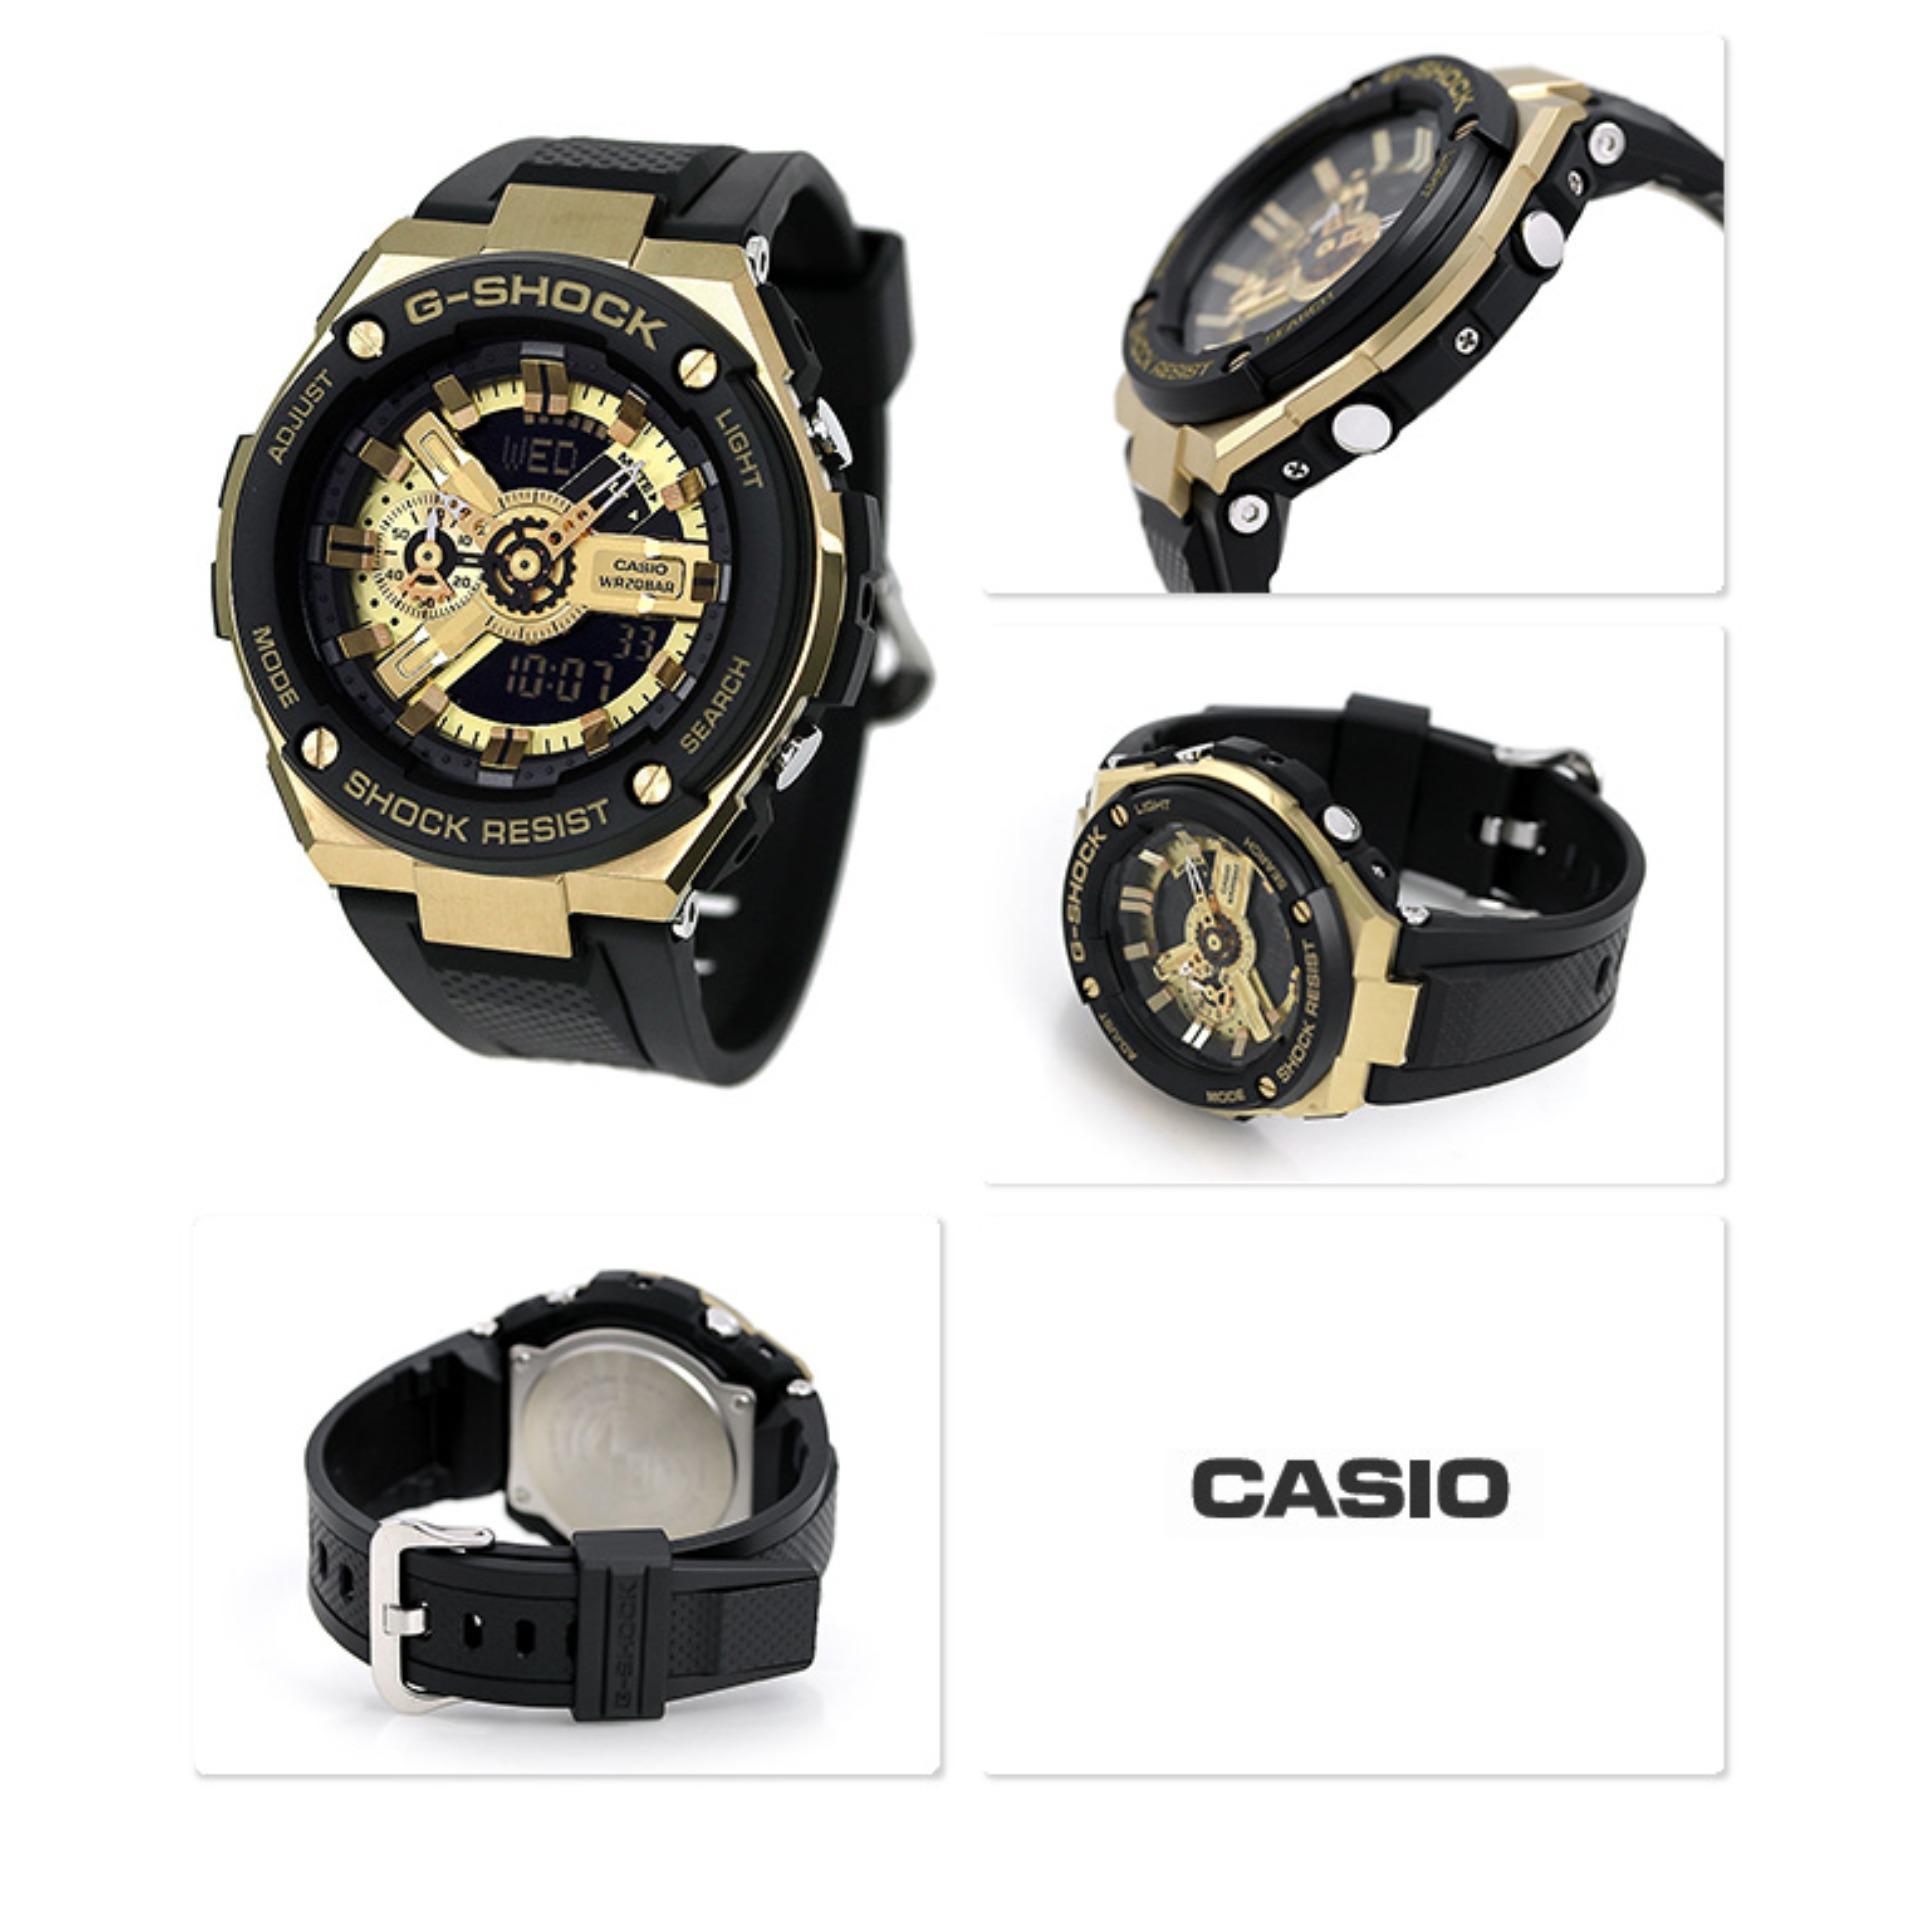 Jam Tangan Casio G Shock Online Terbaru Gx 56bb 1 Pria Black Strap Resin Steel Gst 400g 1a9dr Gold